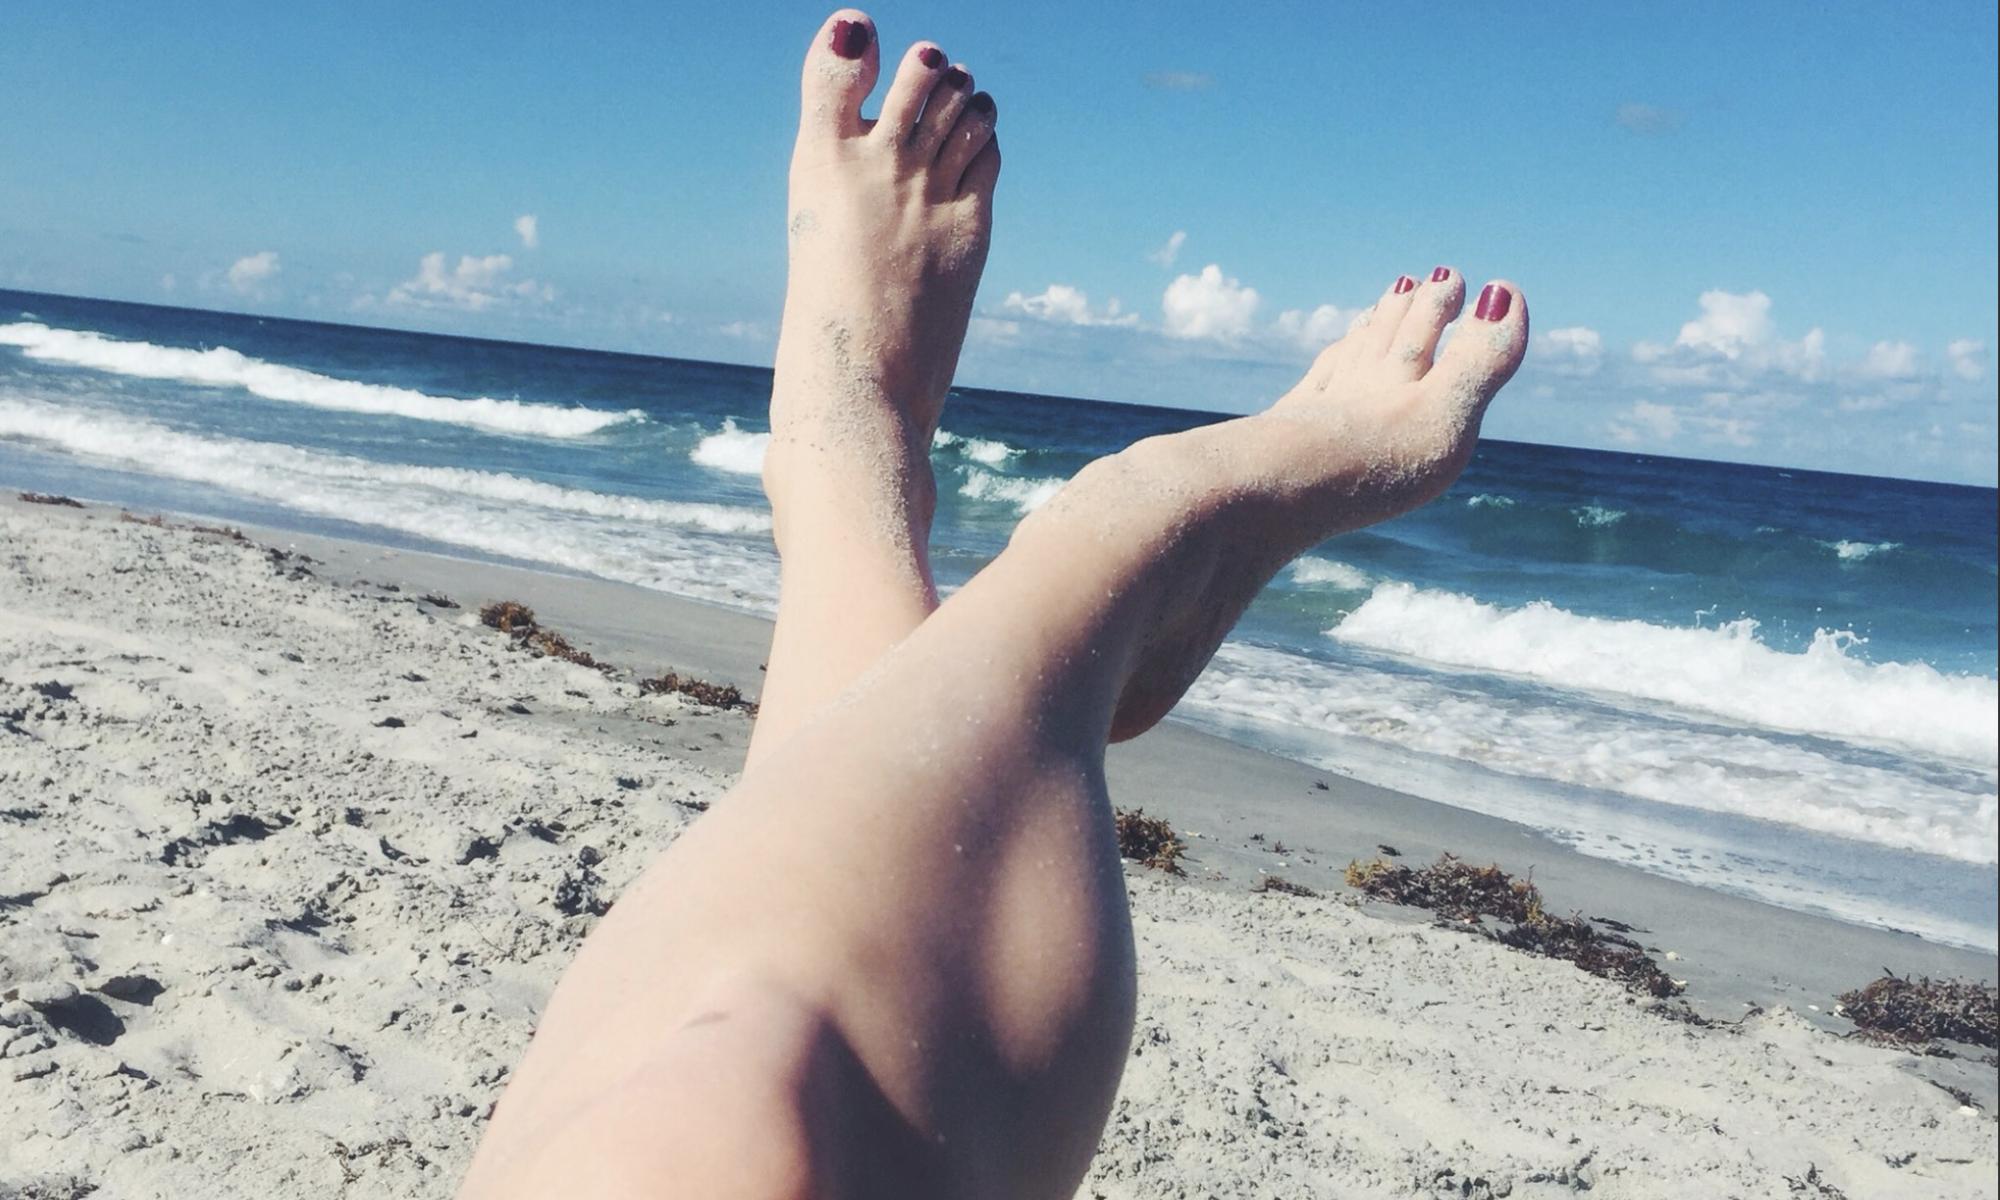 nyc feet on beach mistress blunt